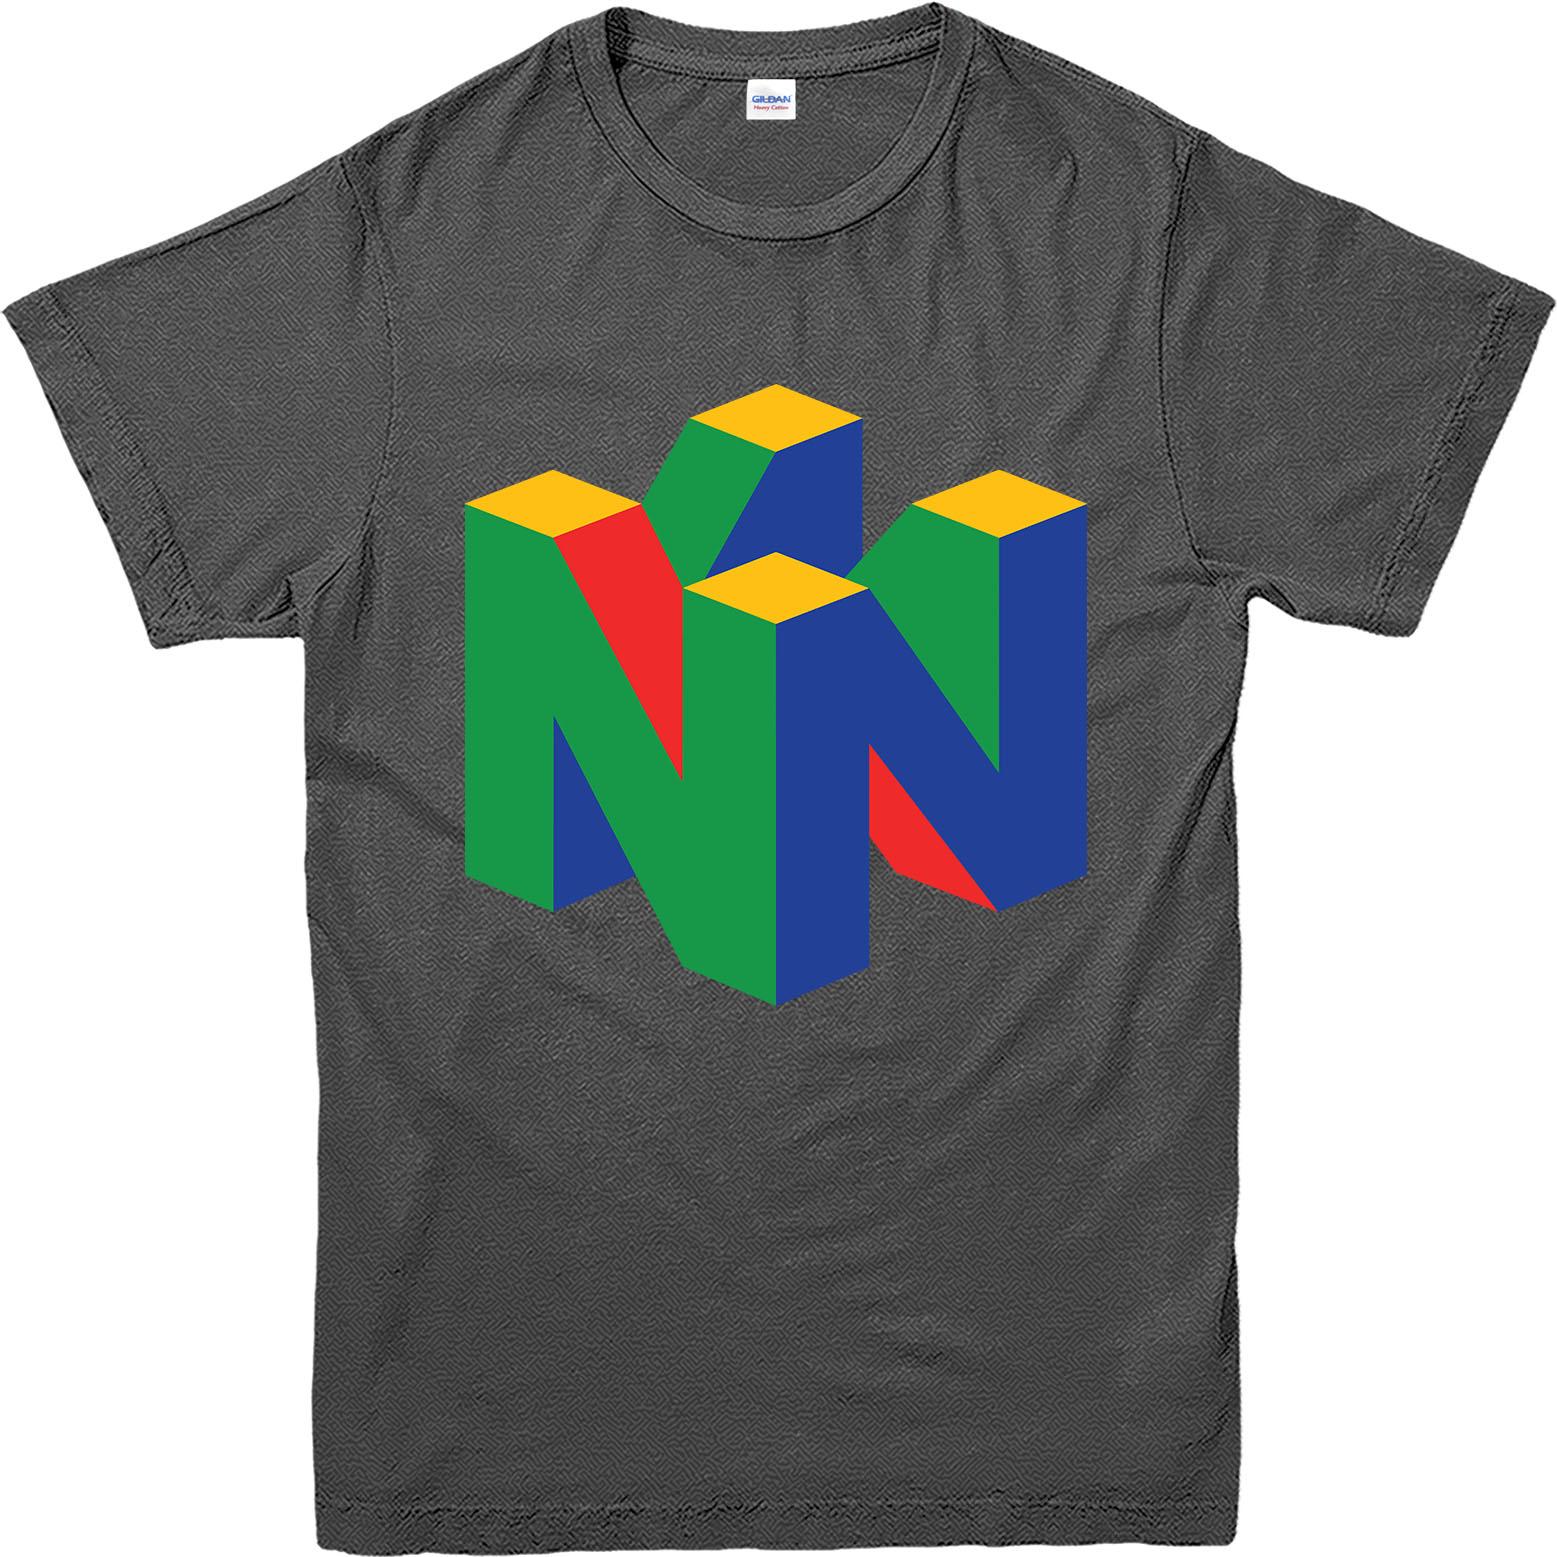 Nintendo-64-T-Shirt-Nintendo-Logo-Inspired-Design-Top